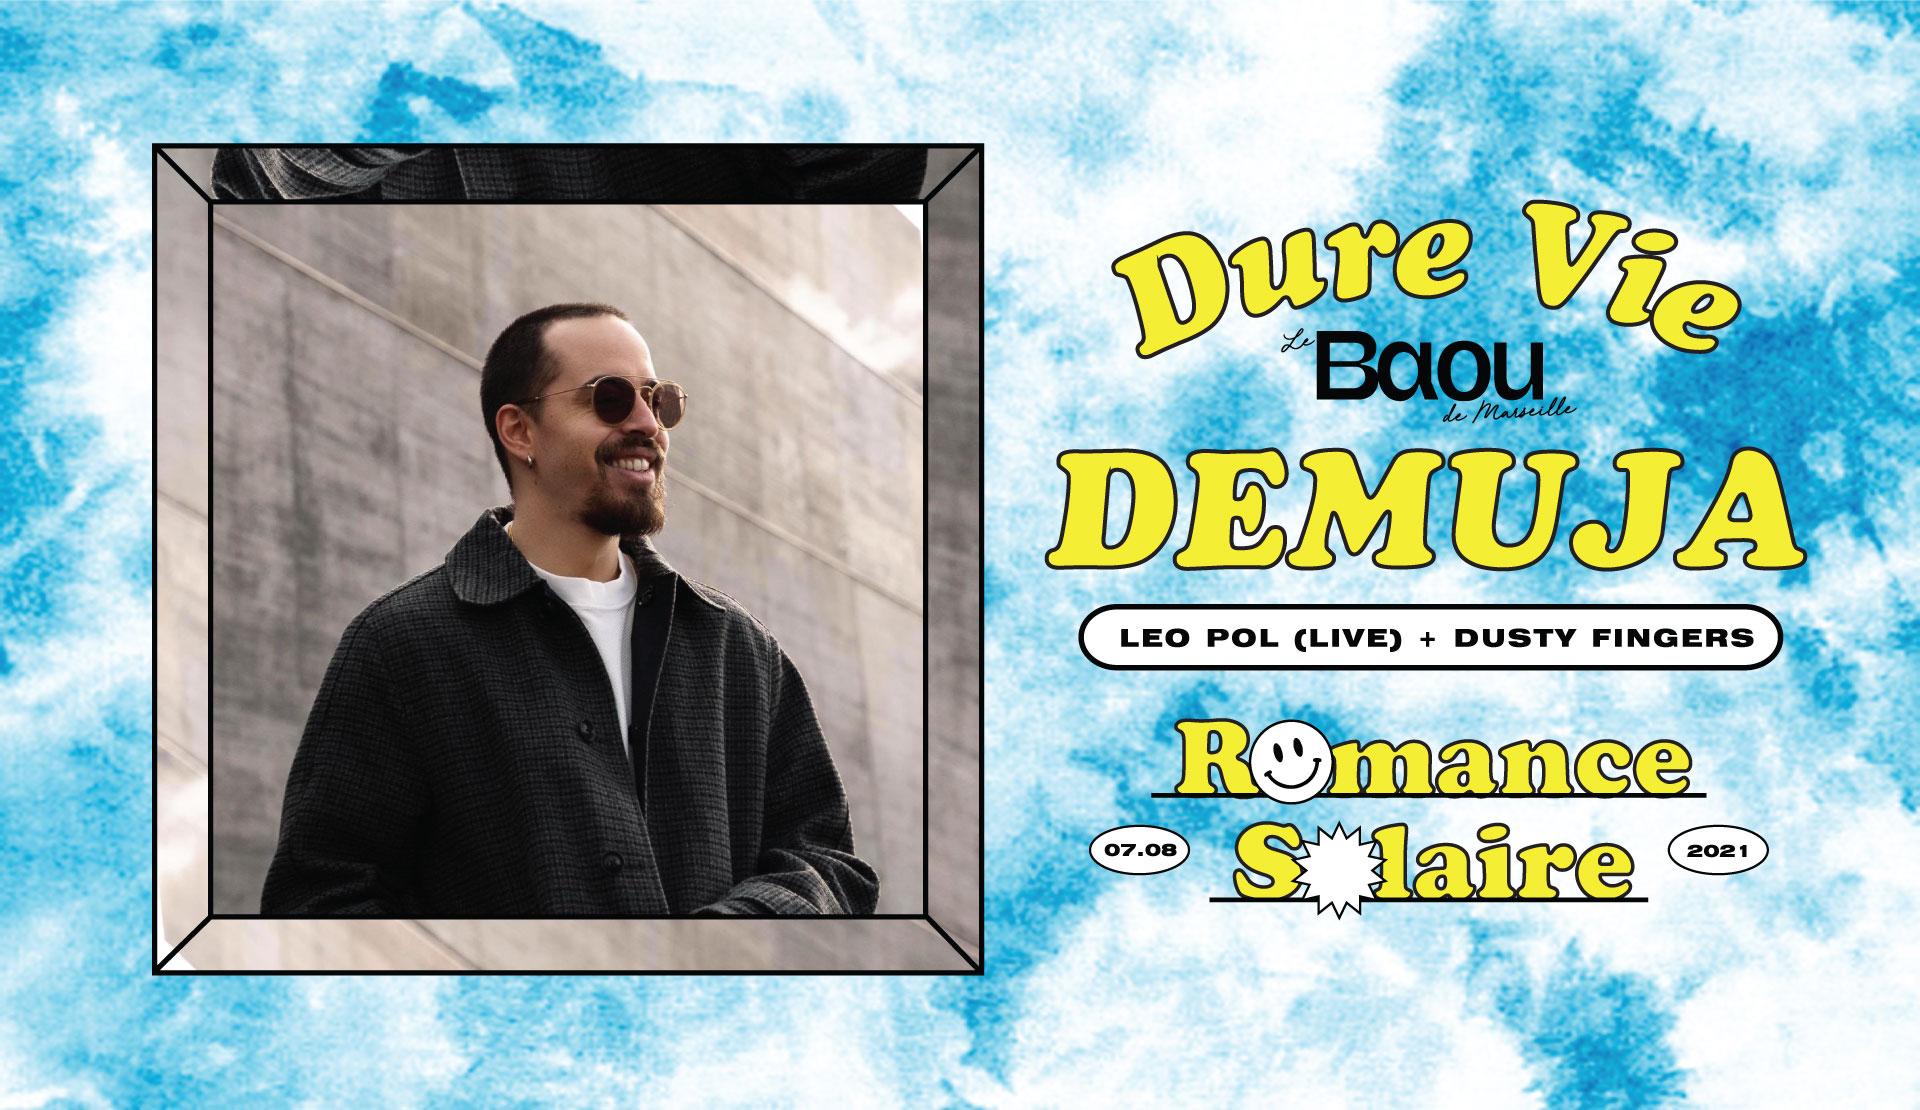 DURE VIE : Demuja / Leo pol (live) / Dusty Fingers